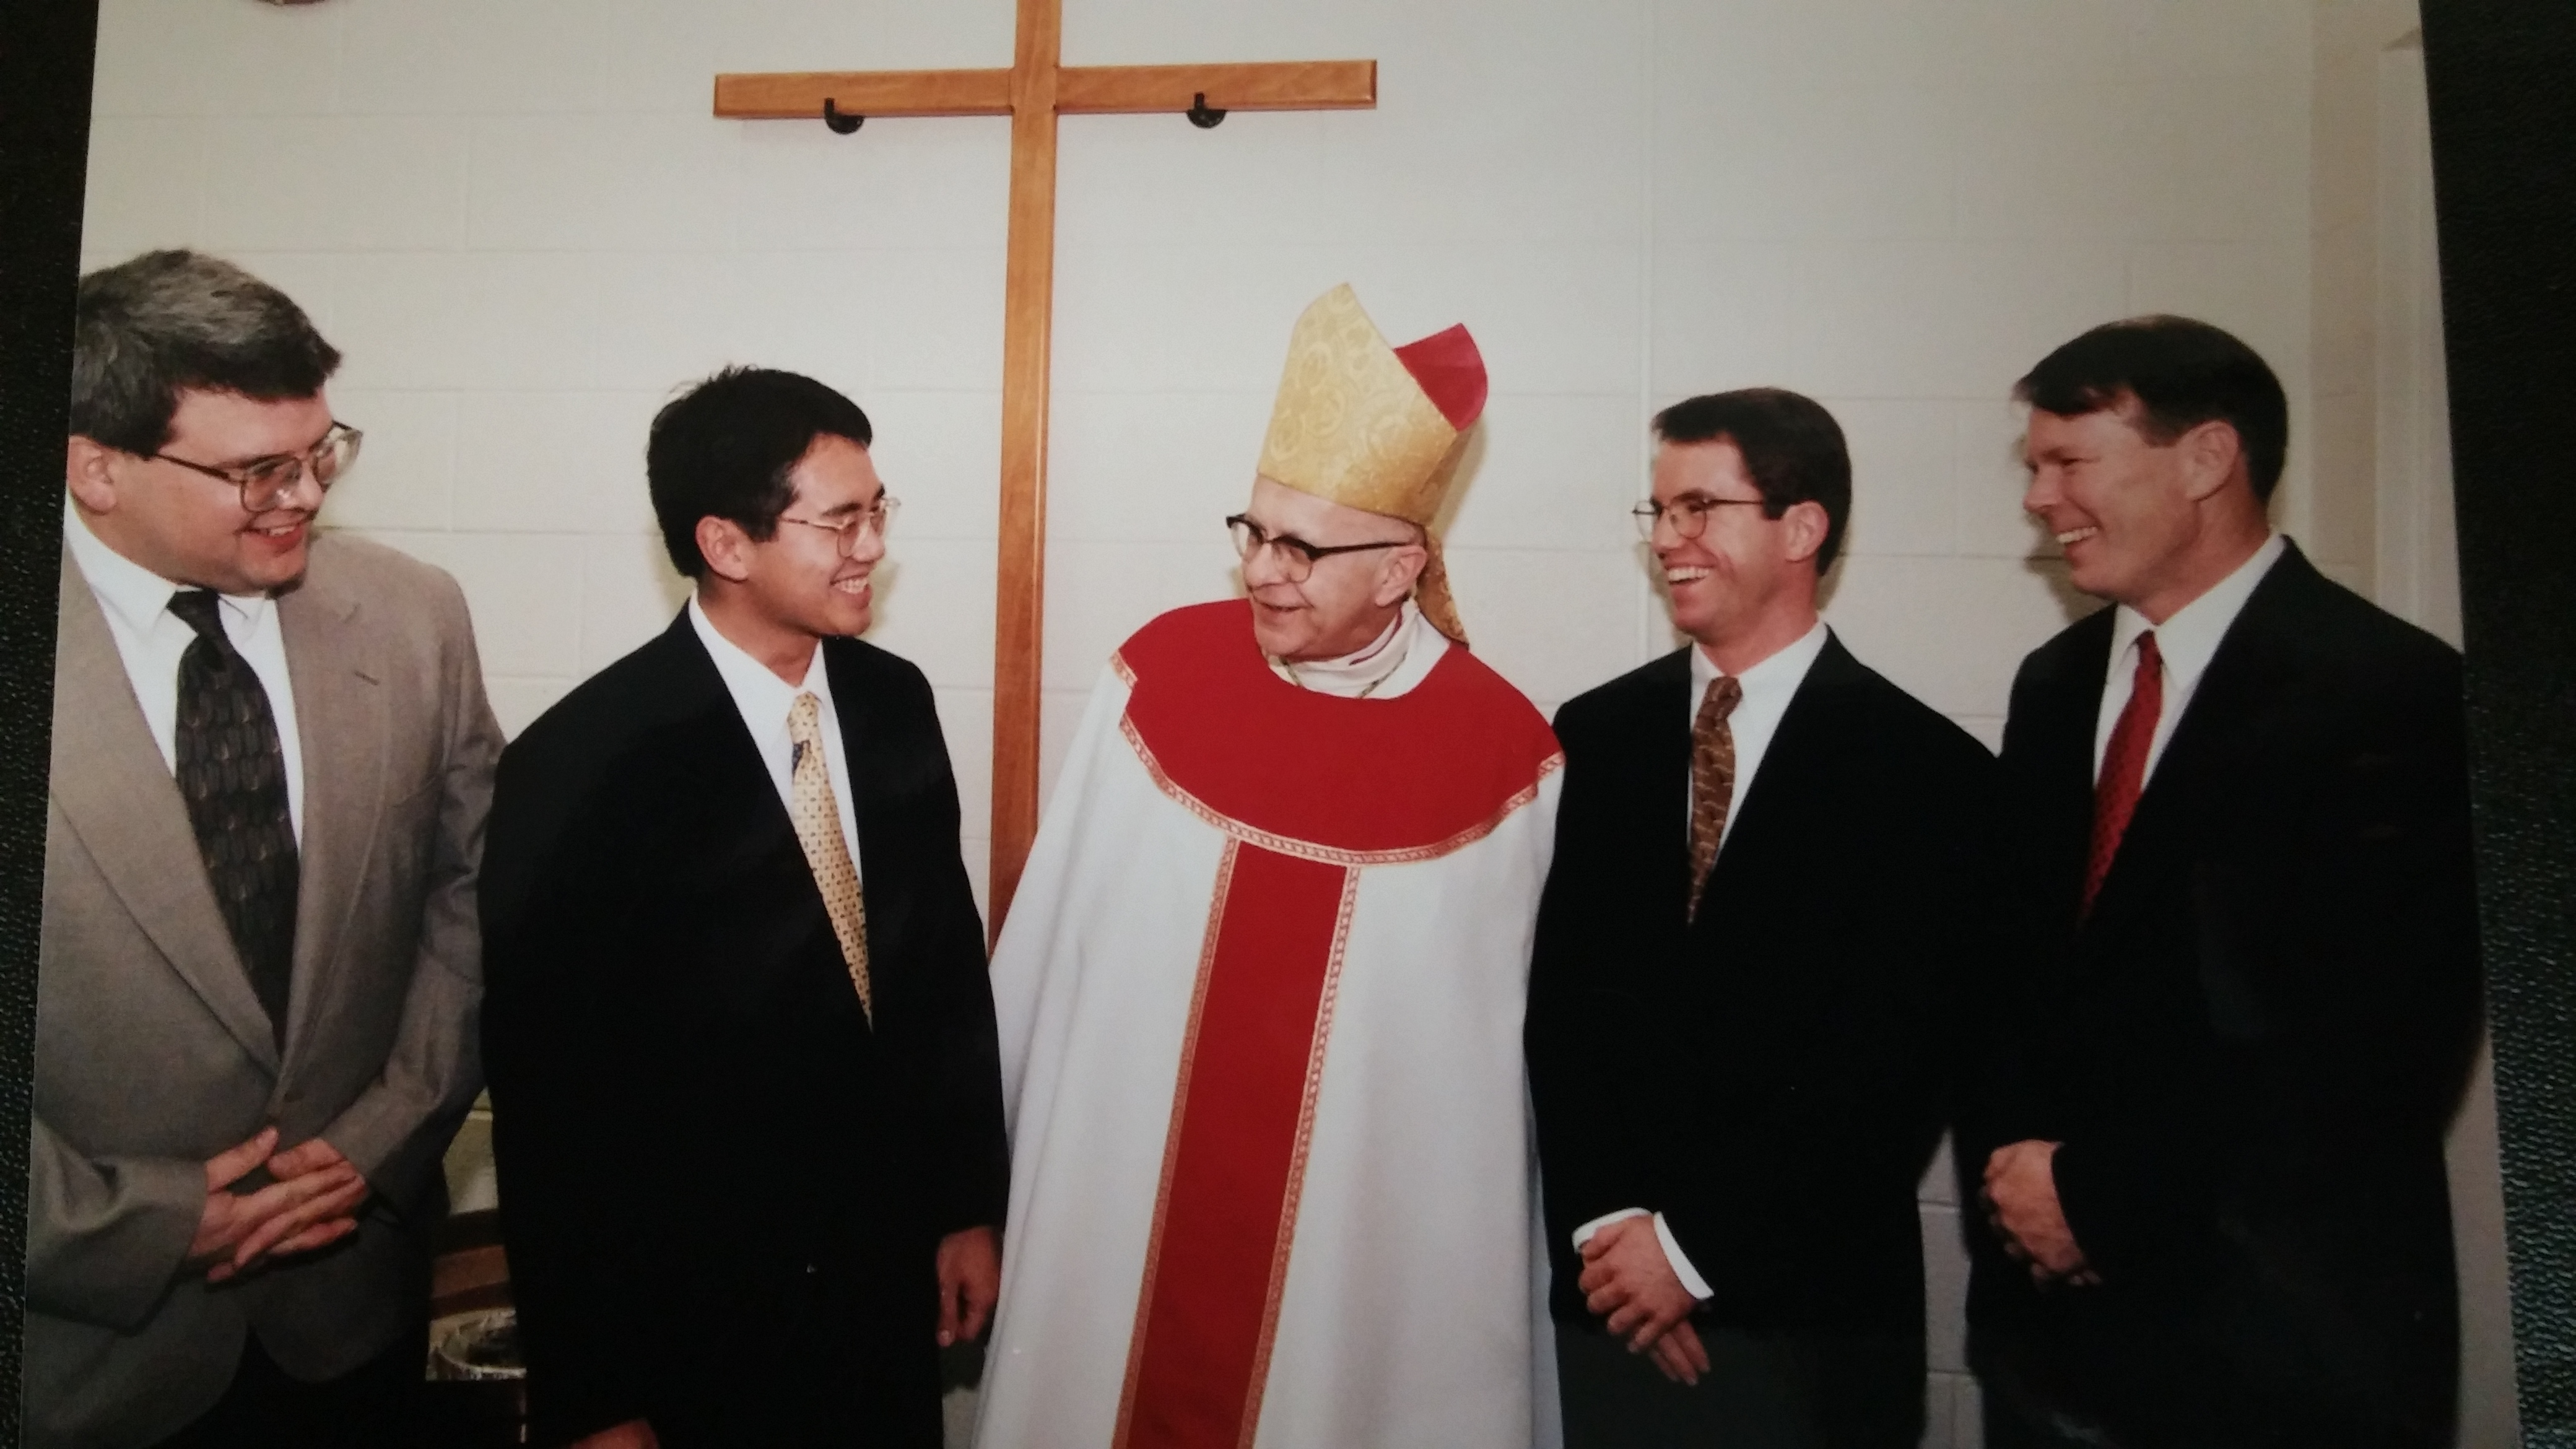 Stephen Kolde, Tuan Do, James Simmons and James Hoffbauer with Archbishop Pilarczyk